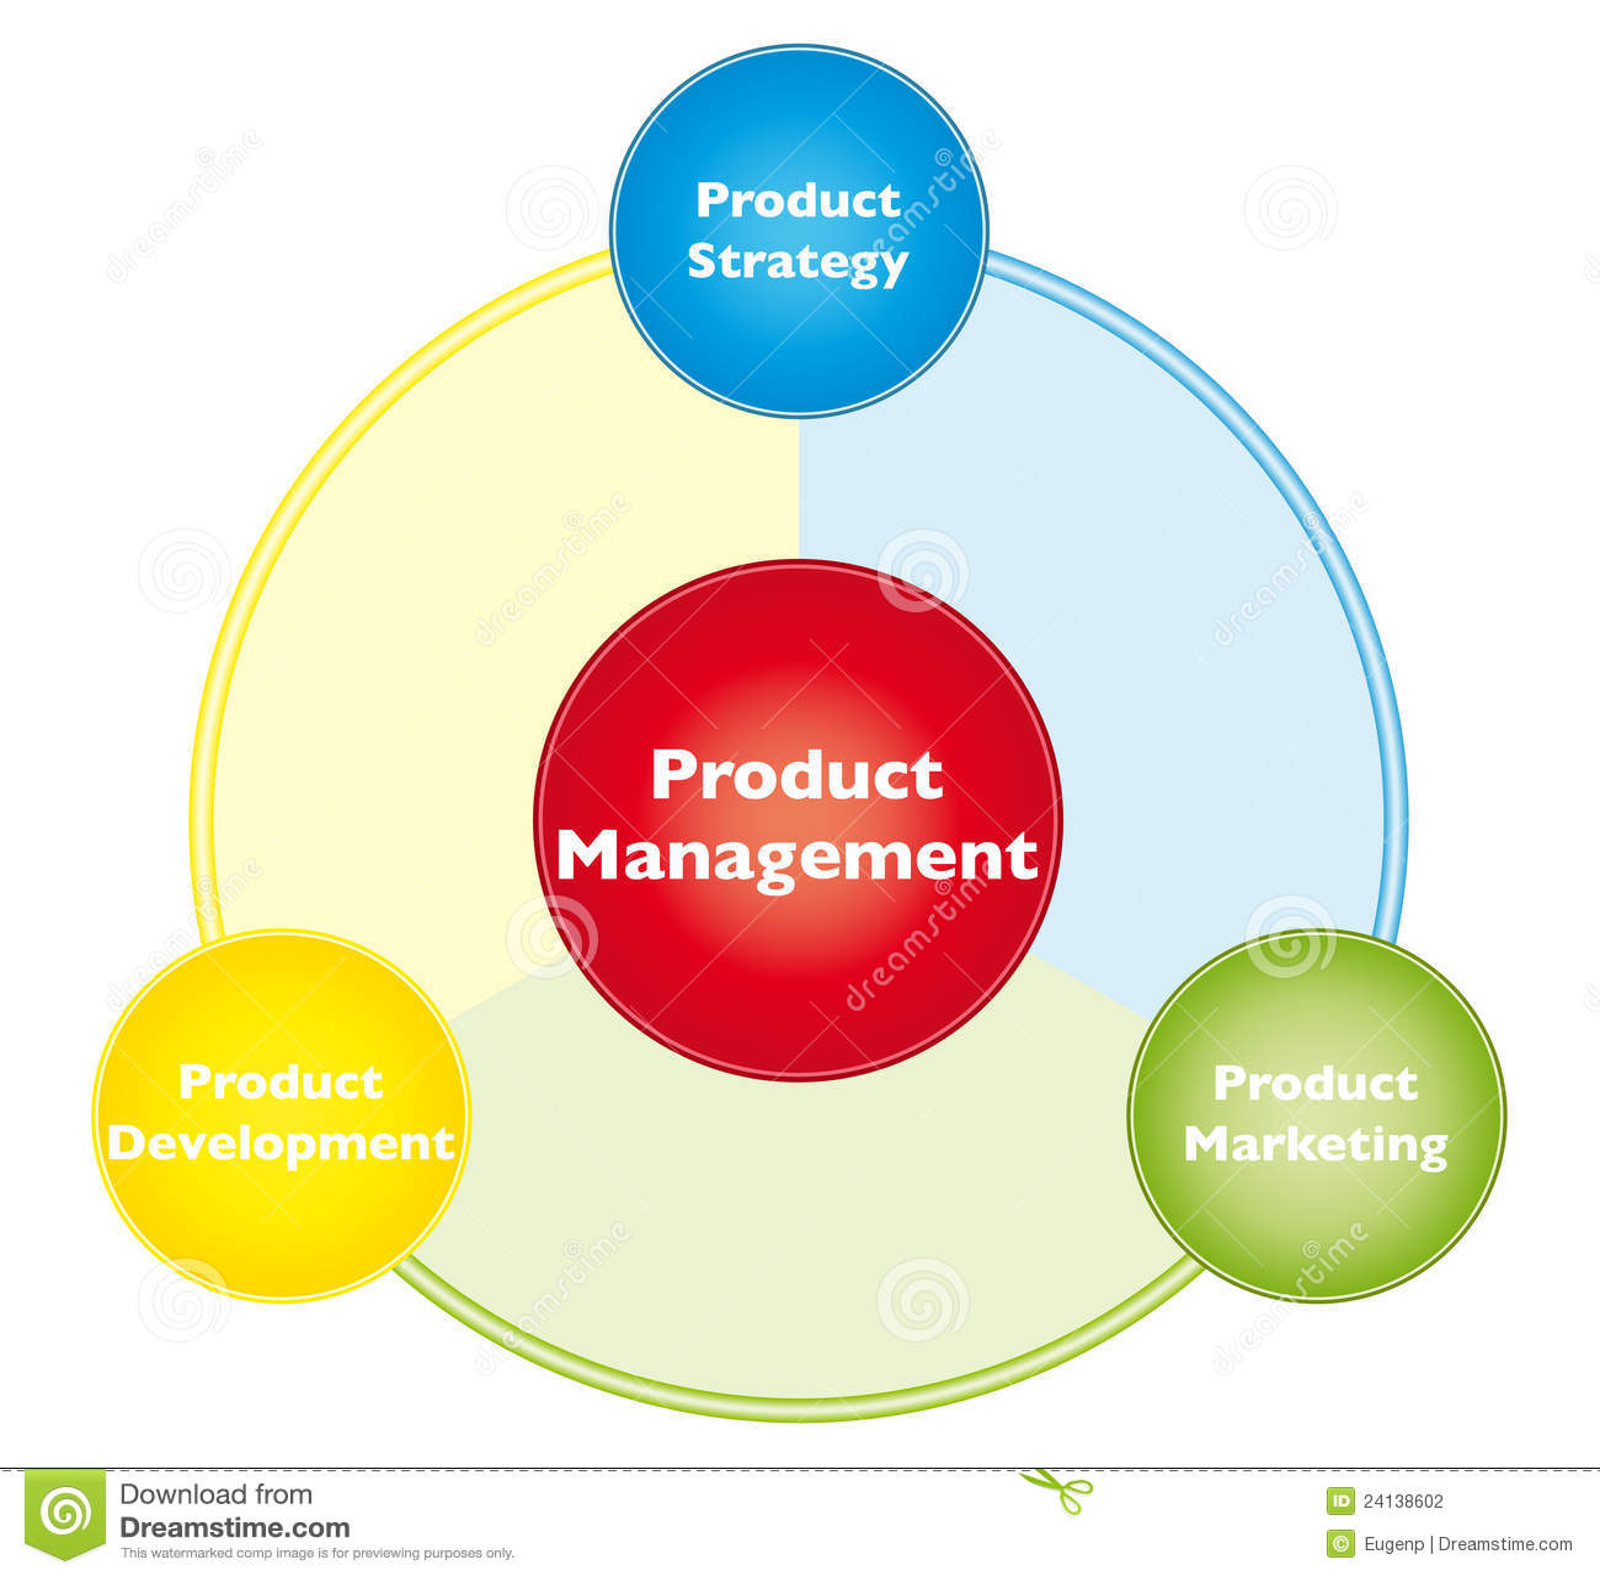 Product Management Stock Photography  Image: 24138602